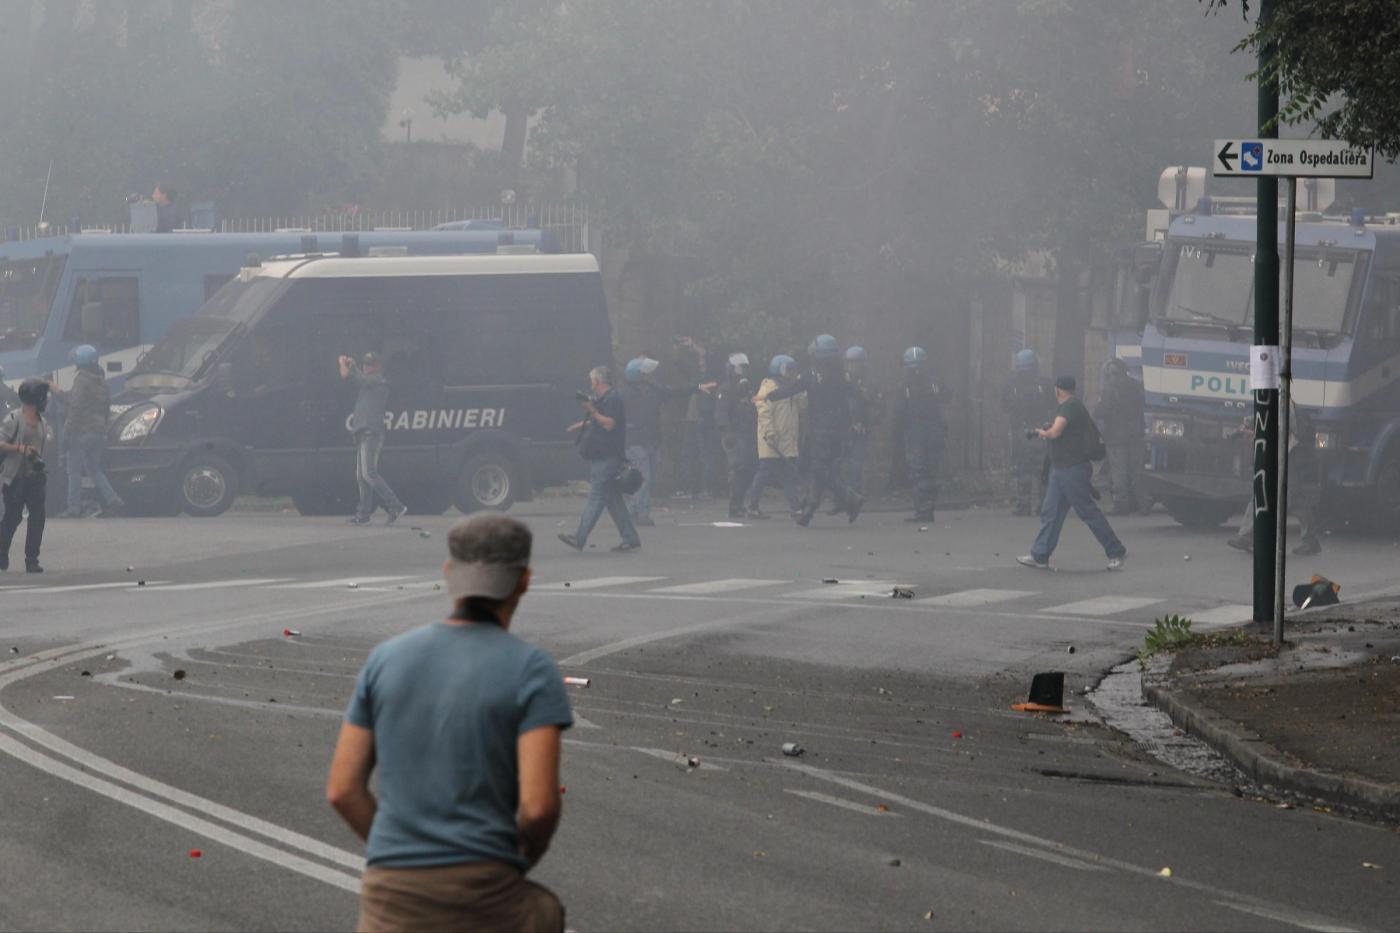 Corteo anti-Bce a Napoli